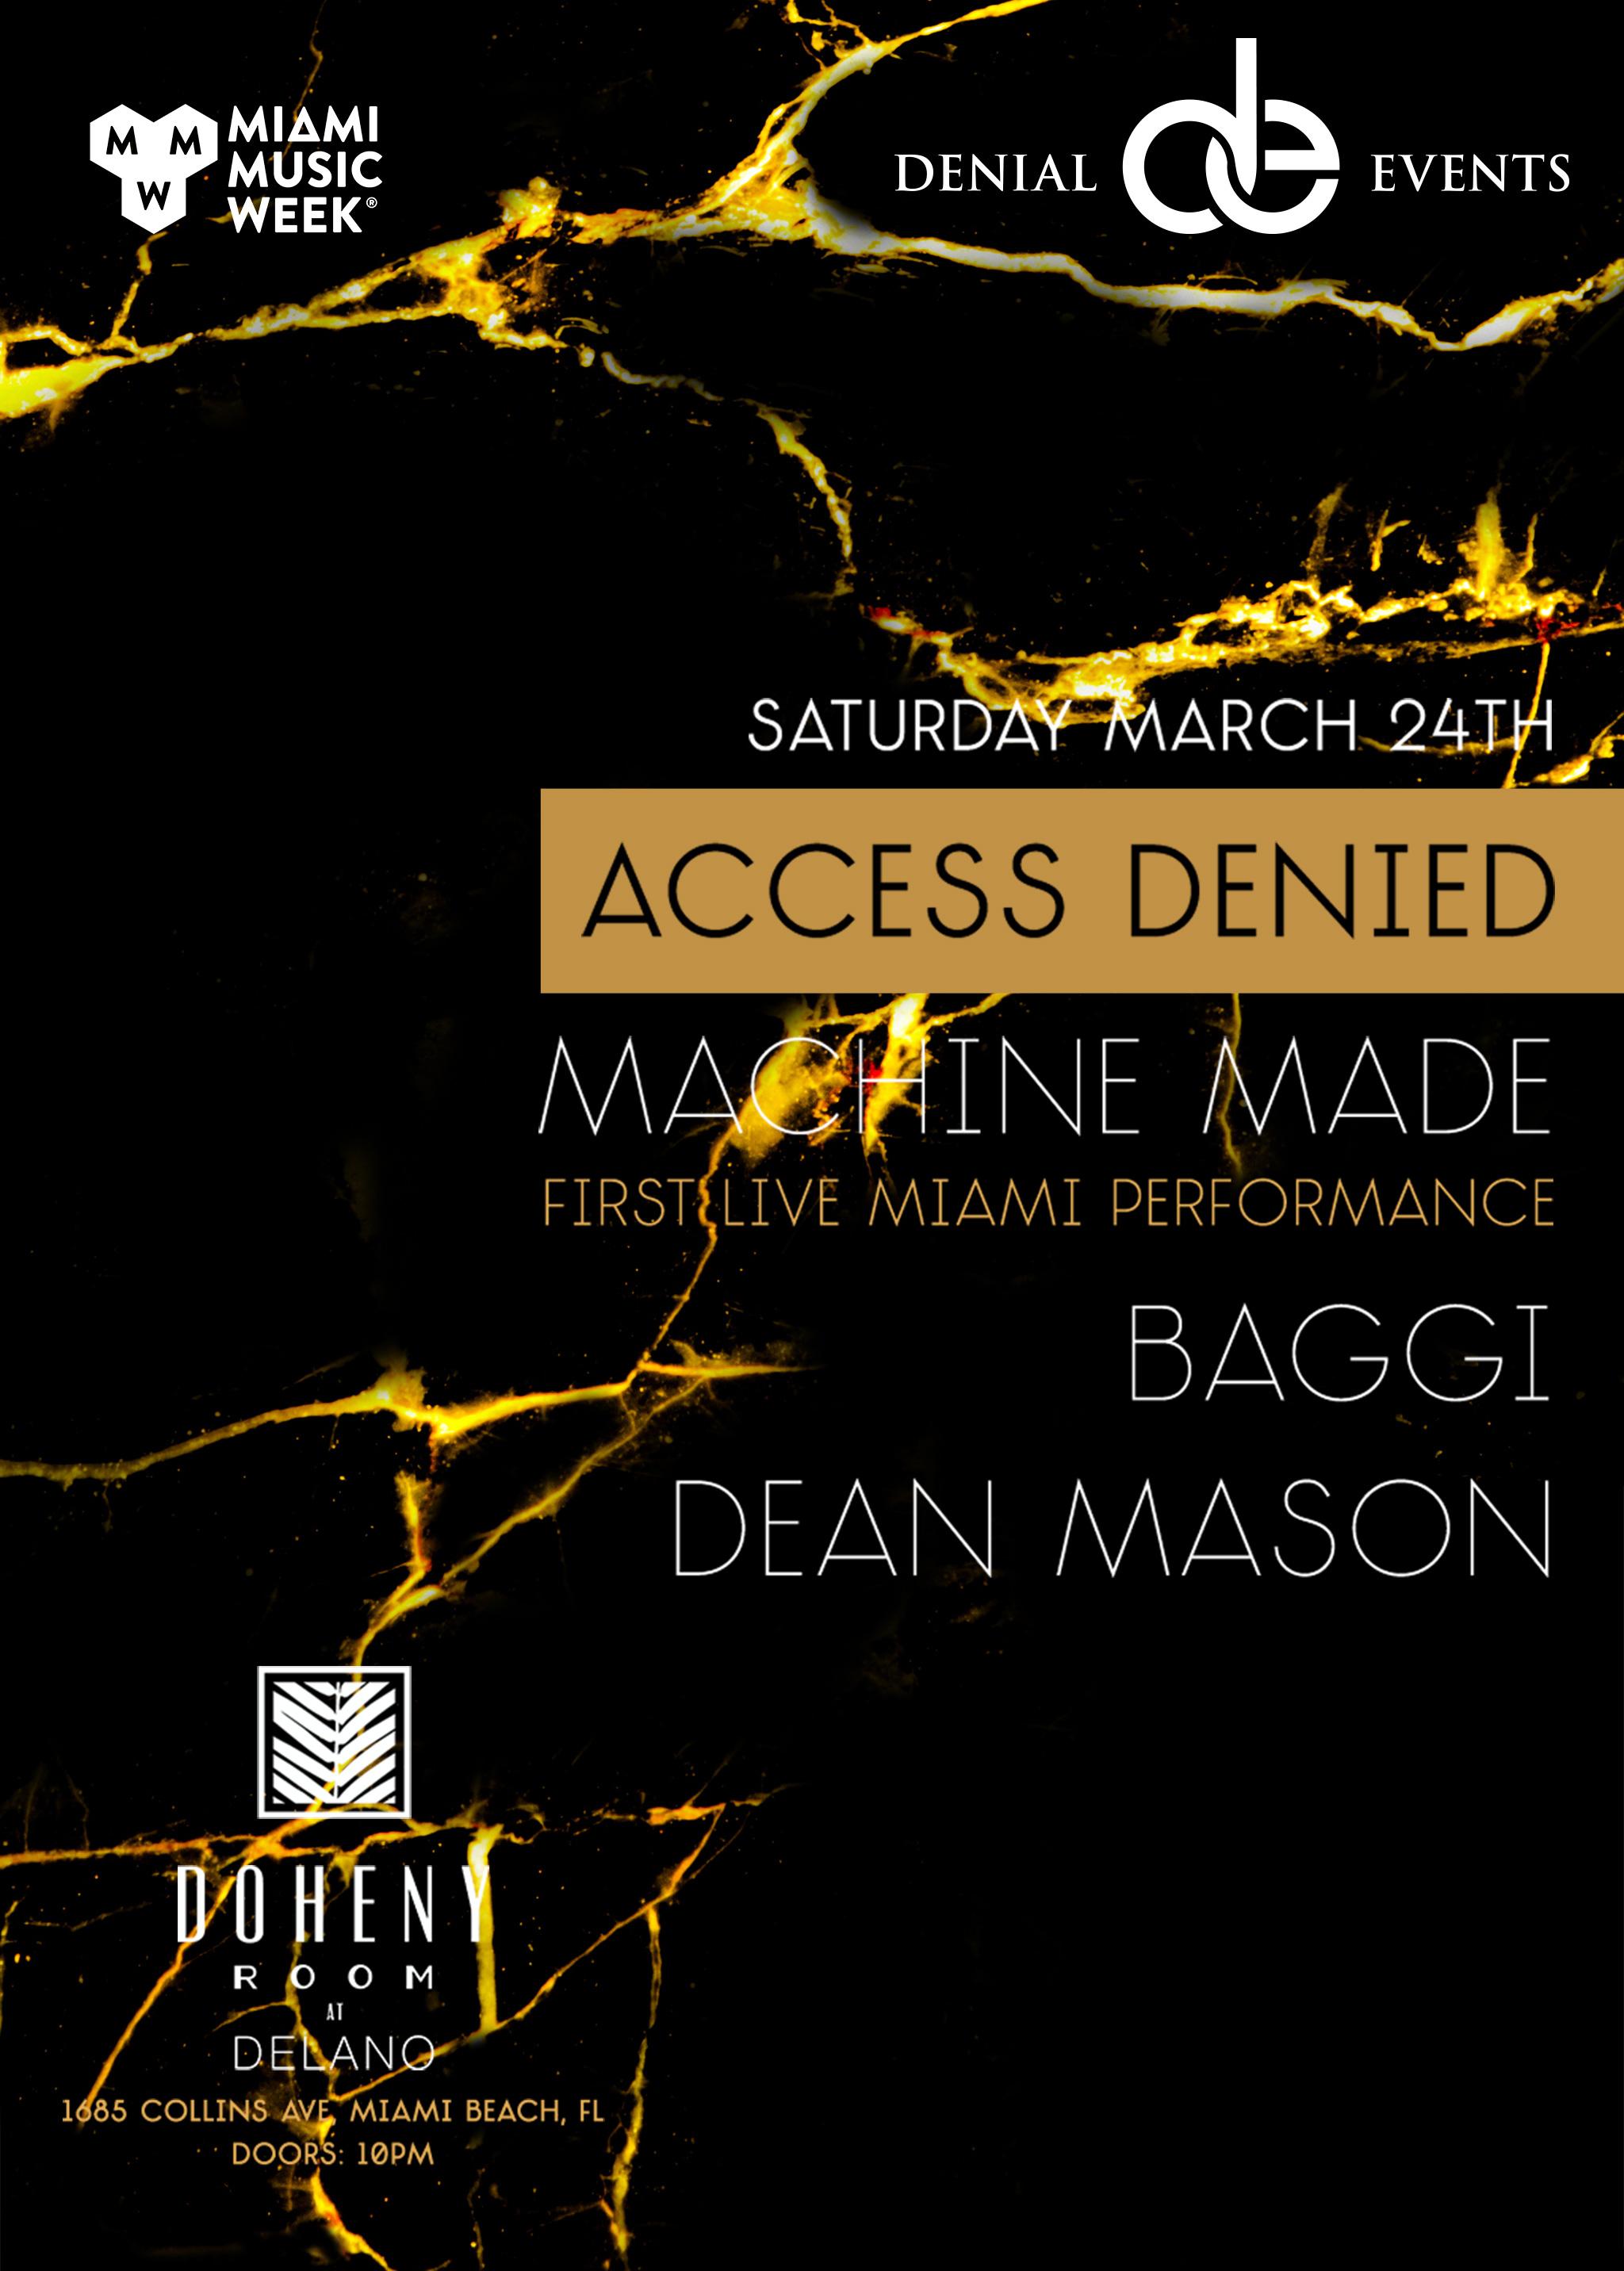 Access Denied with Machine Made, Baggi, & Dean Mason Image